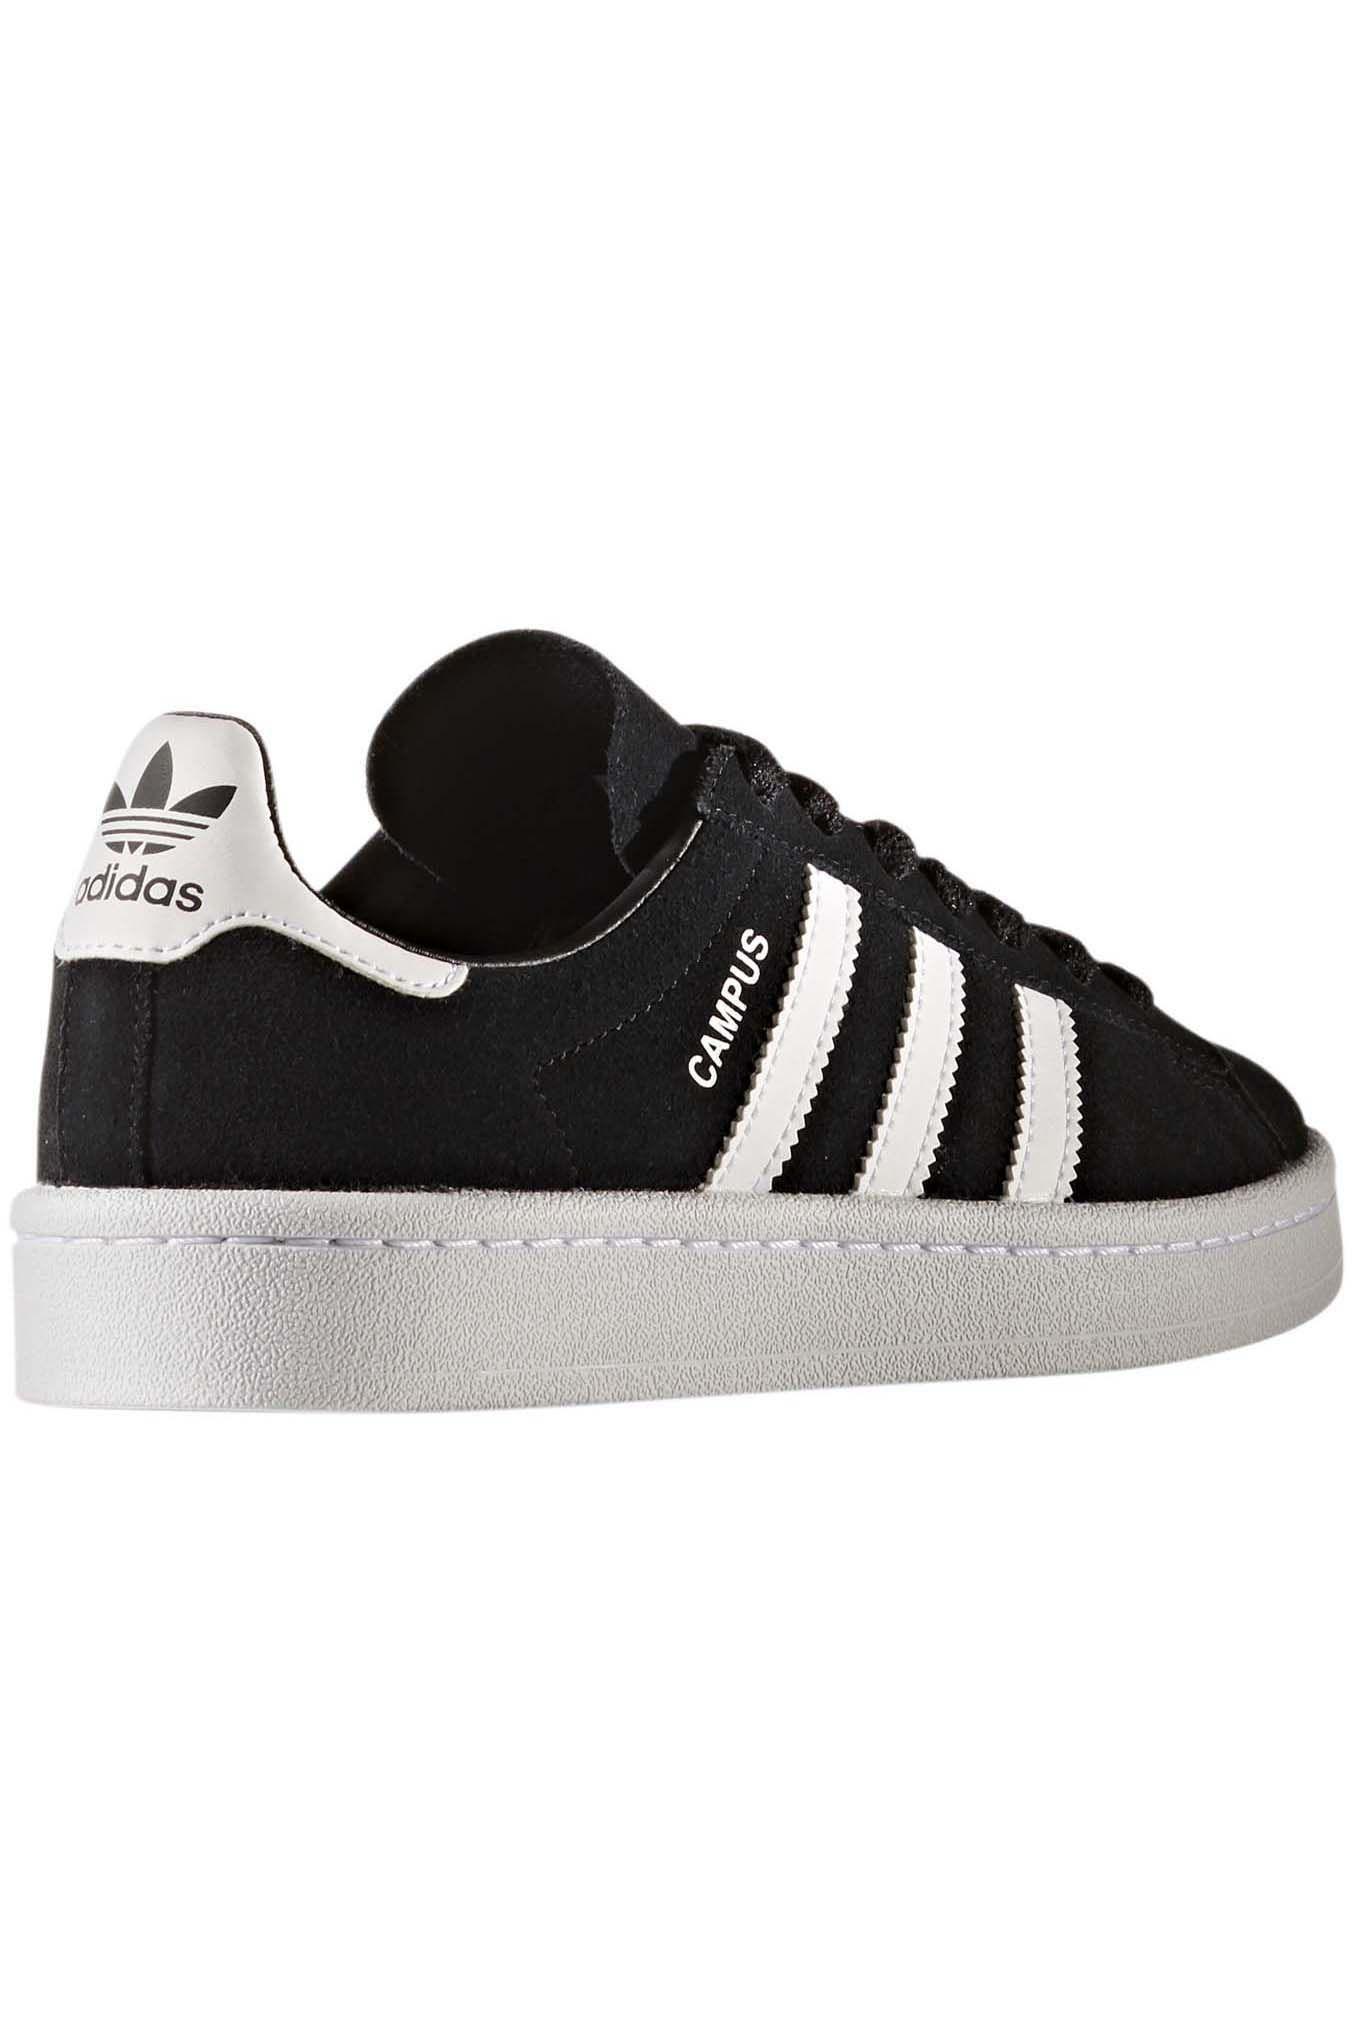 3eb70bfabf4 ... Tenis Adidas CAMPUS J Core Black Ftwr White Ftwr White